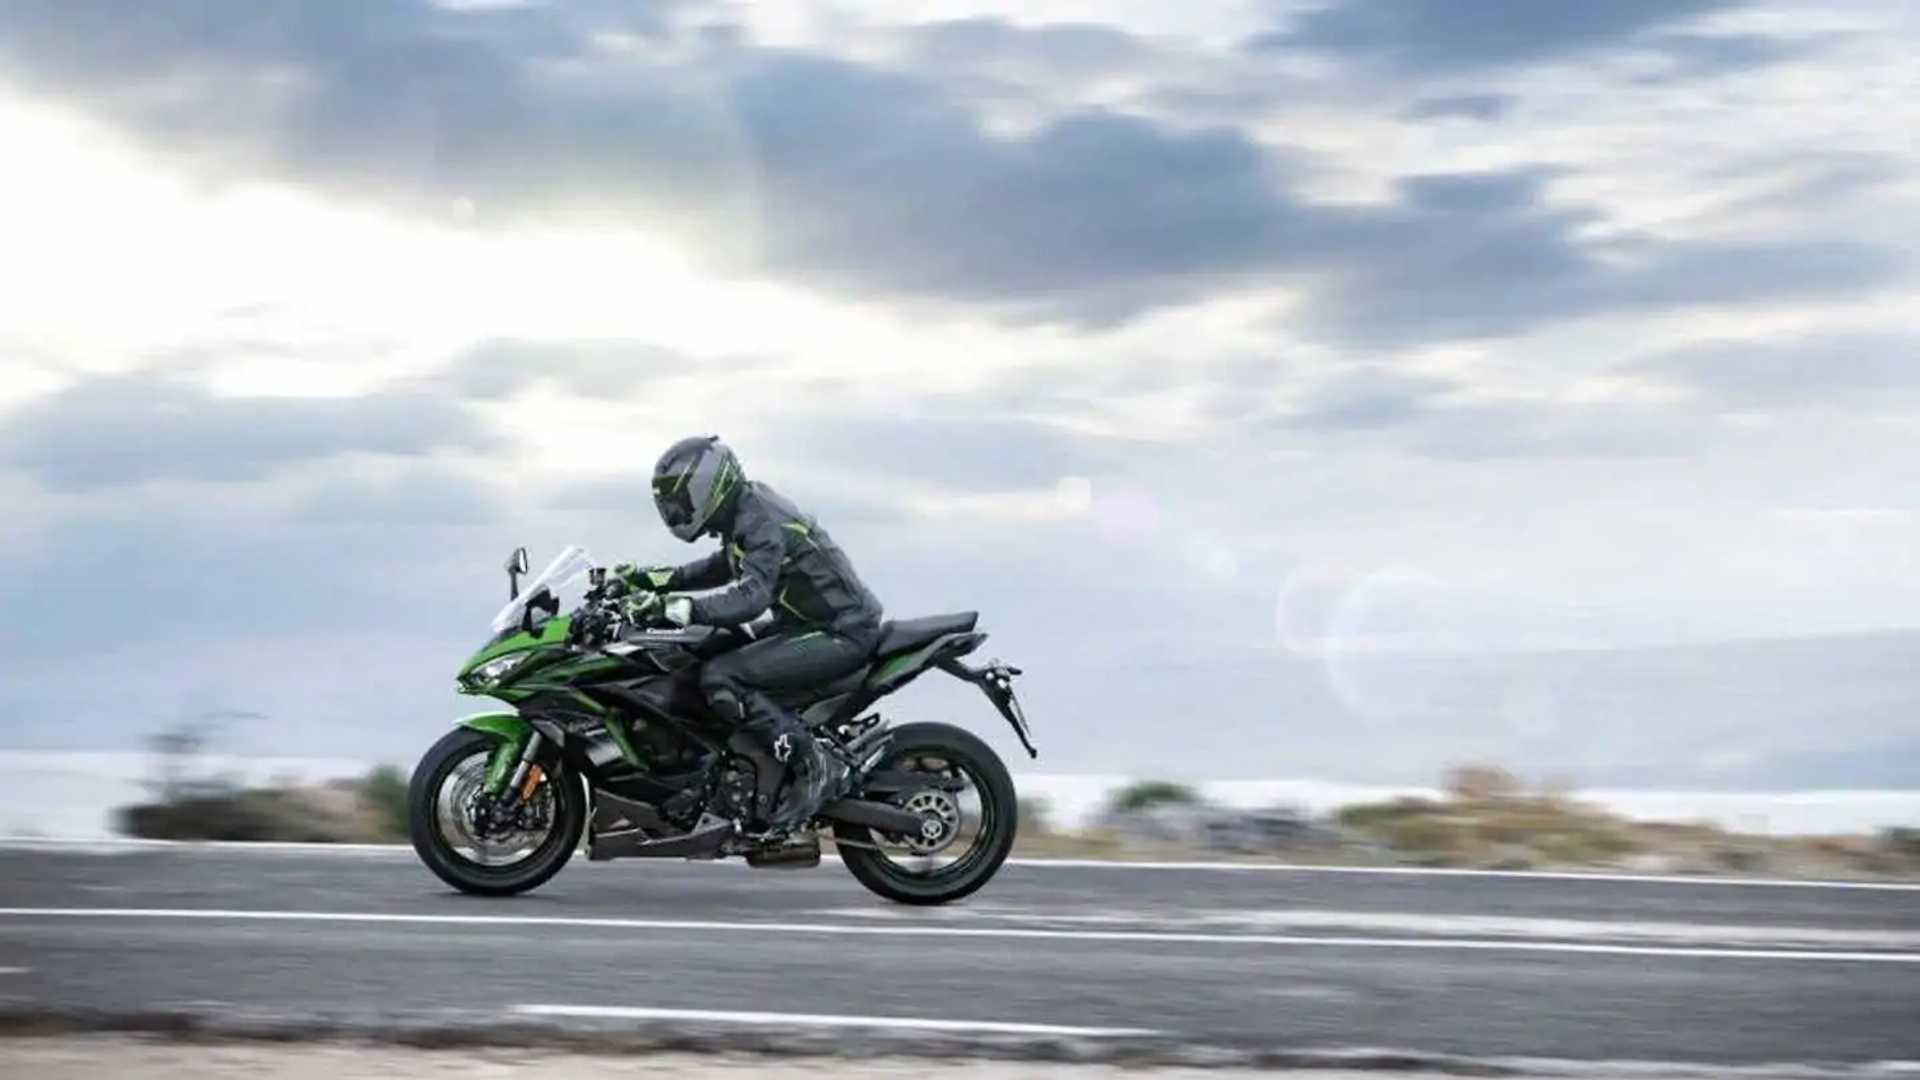 2022 Kawasaki Ninja 1000SX - Lens Flare